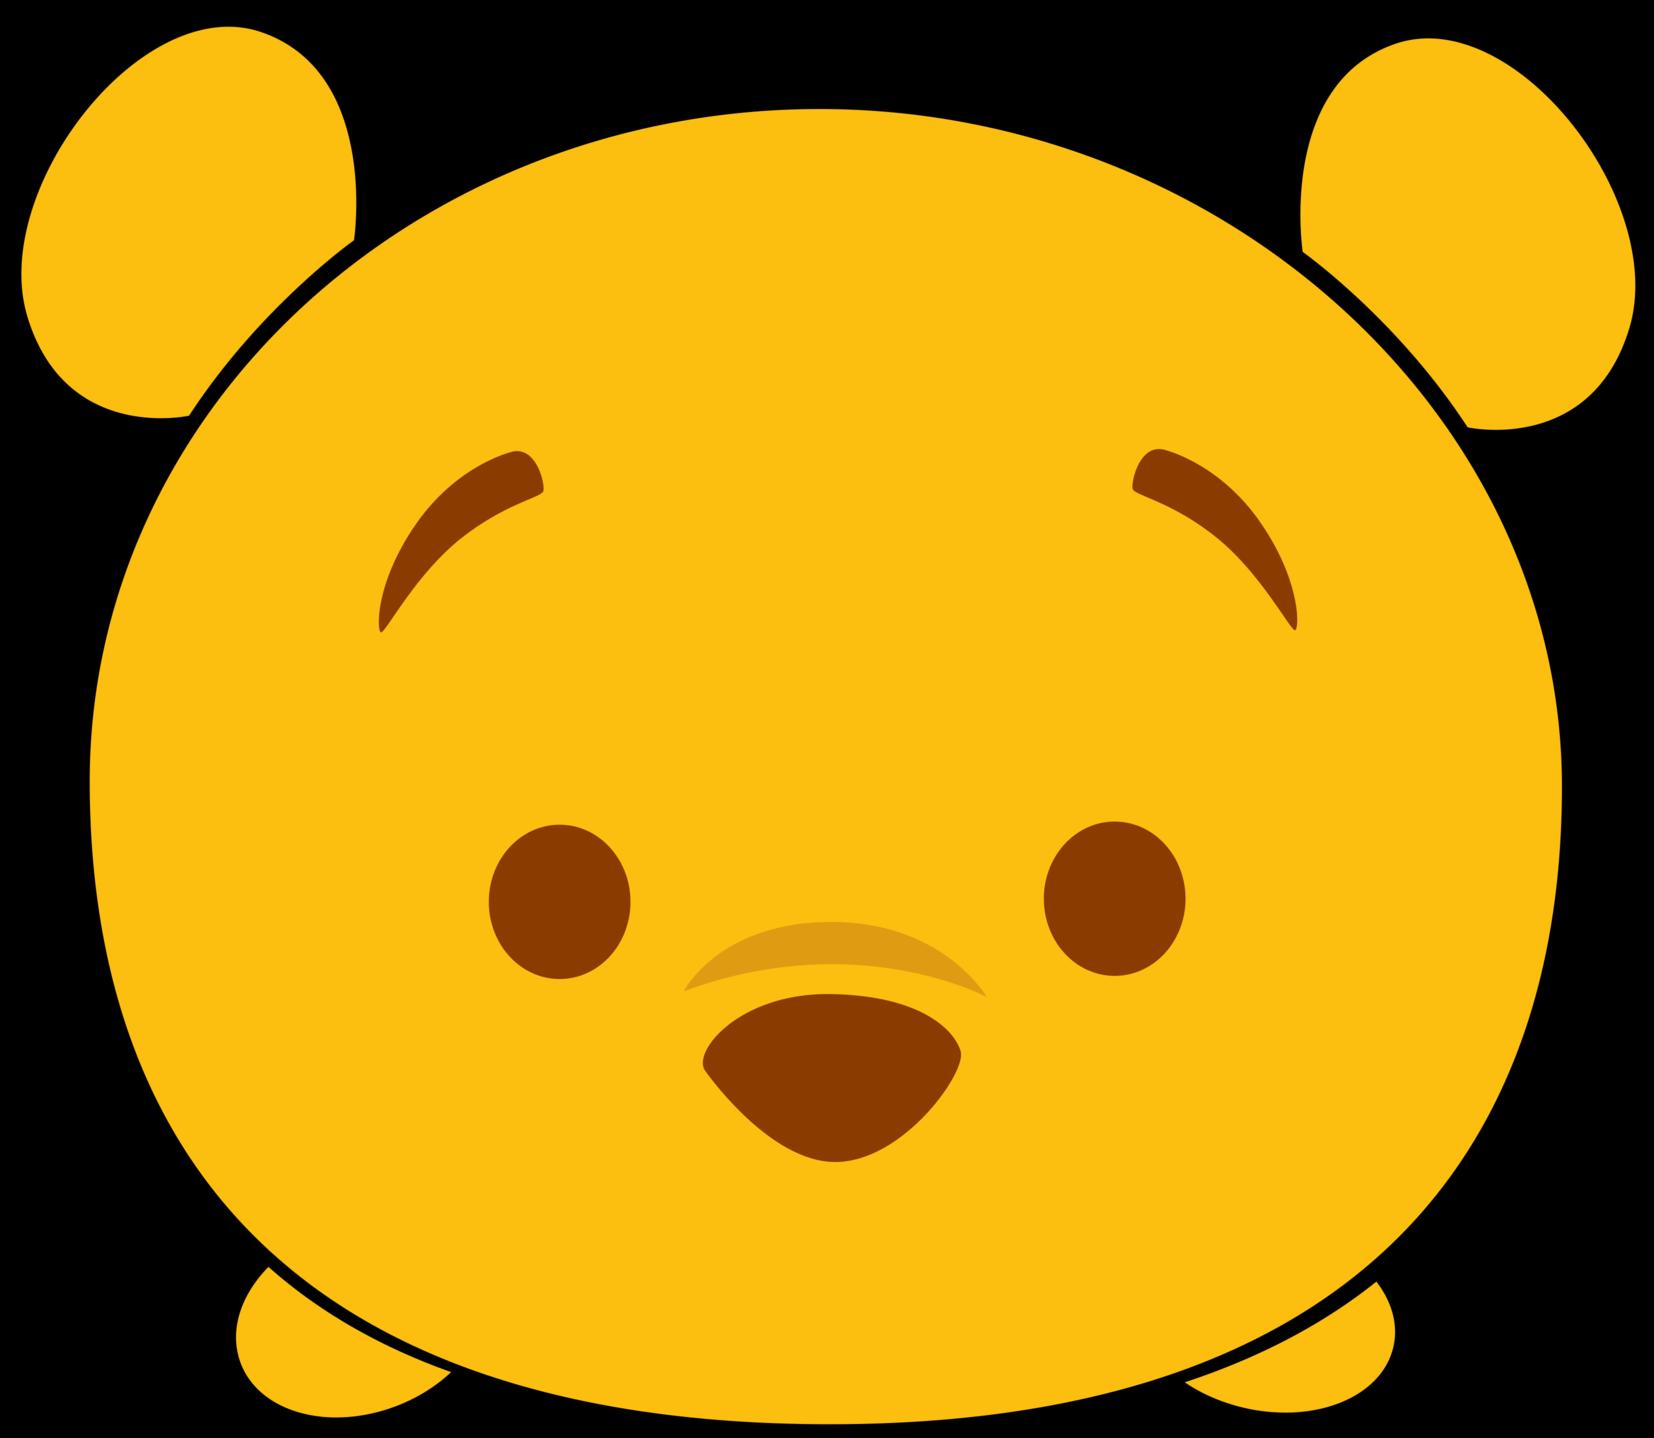 Disney tsum tsum clipart svg freeuse download Disney Tsum Tsum Clipart Winnie The Pooh svg freeuse download